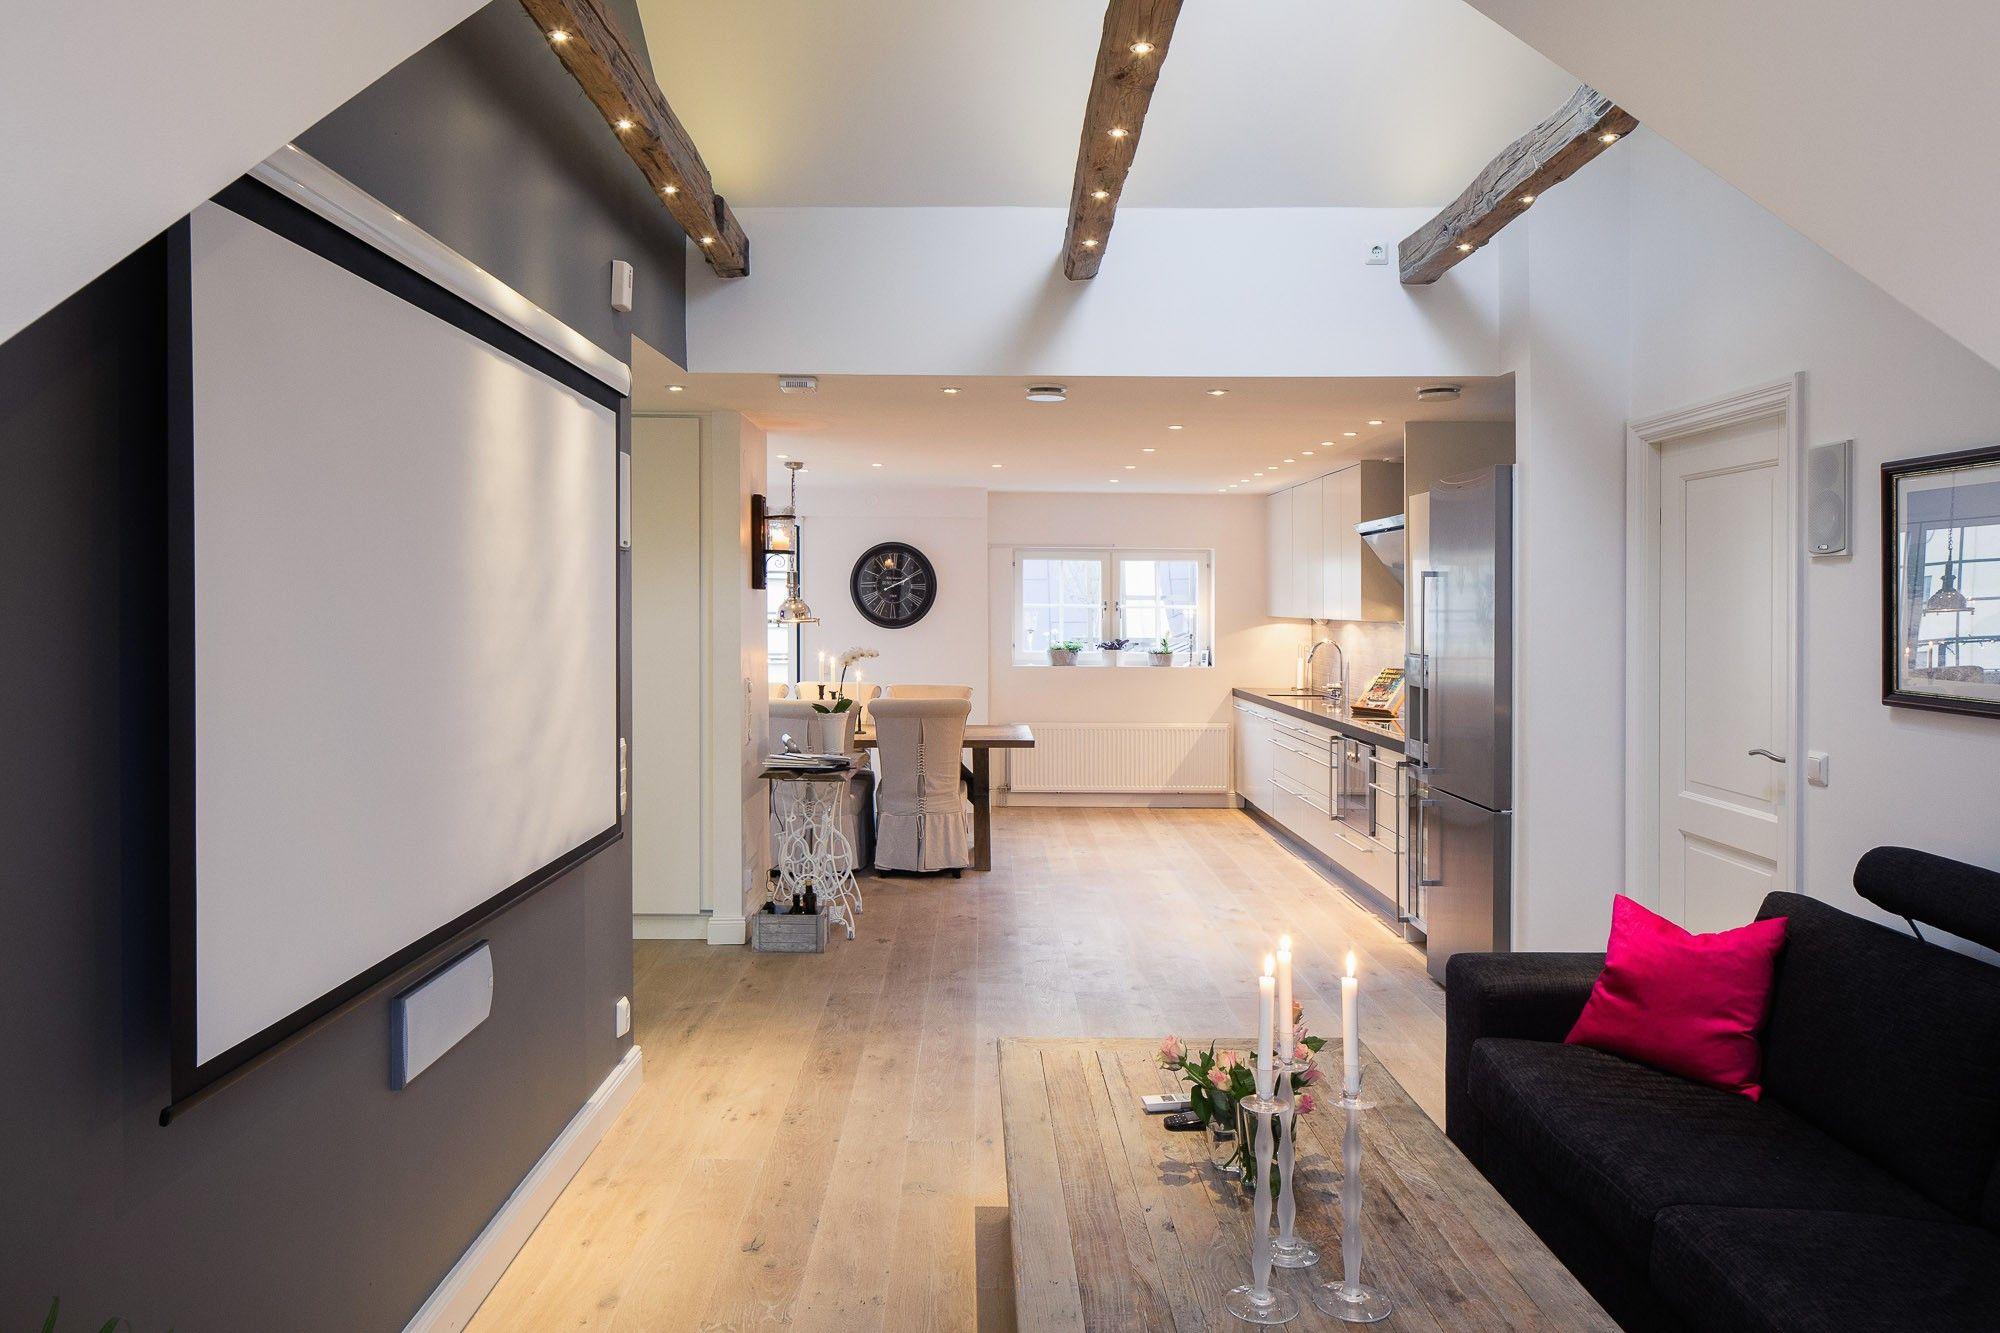 Studio Bedsit Flat - London, England   Apartment Interior Design ...